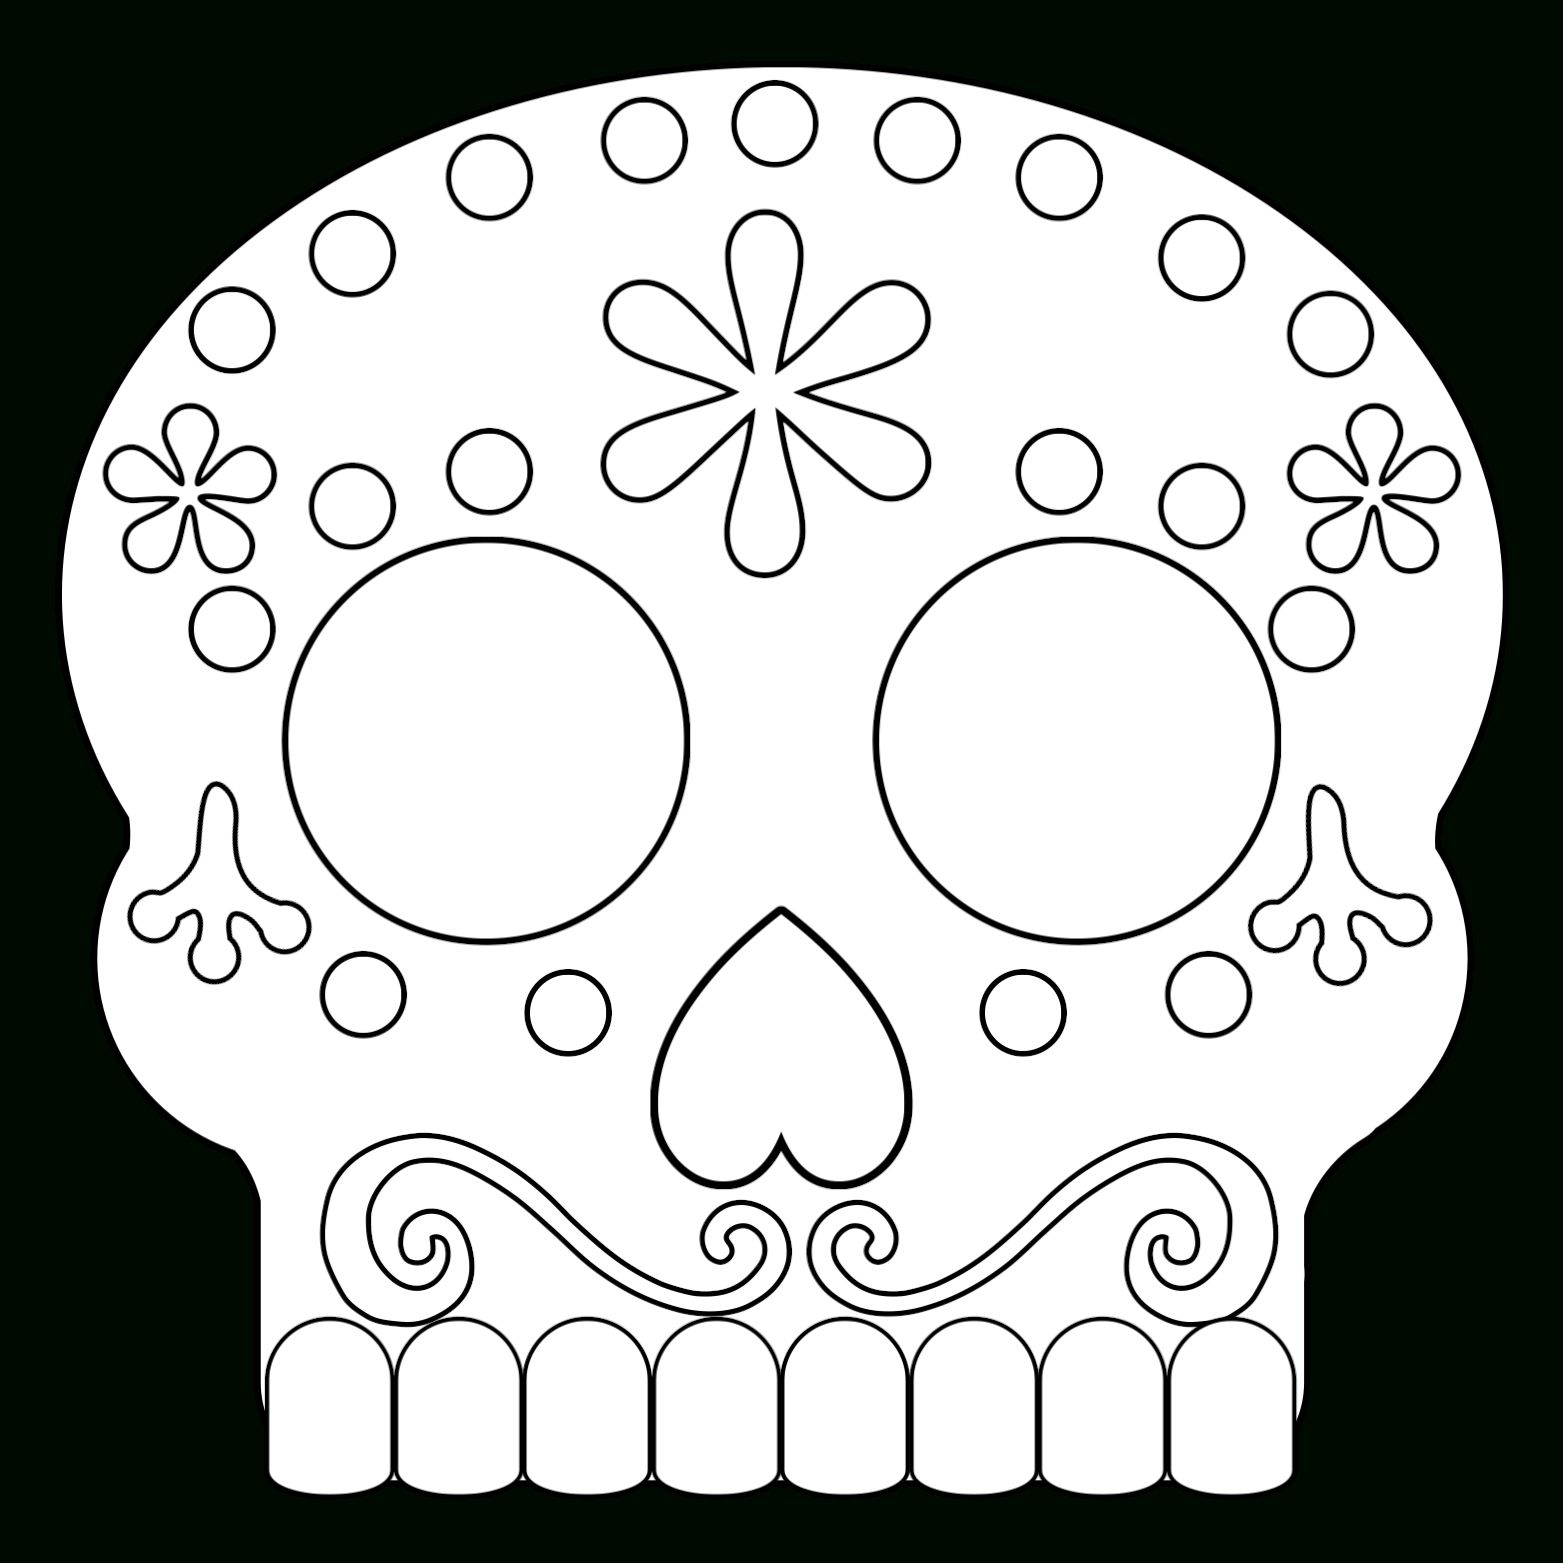 Day Of The Dead Masks Sugar Skulls Free Printable Paper In Blank Sugar Skull Template Best Professional Skull Template Day Of The Dead Mask Printable Paper